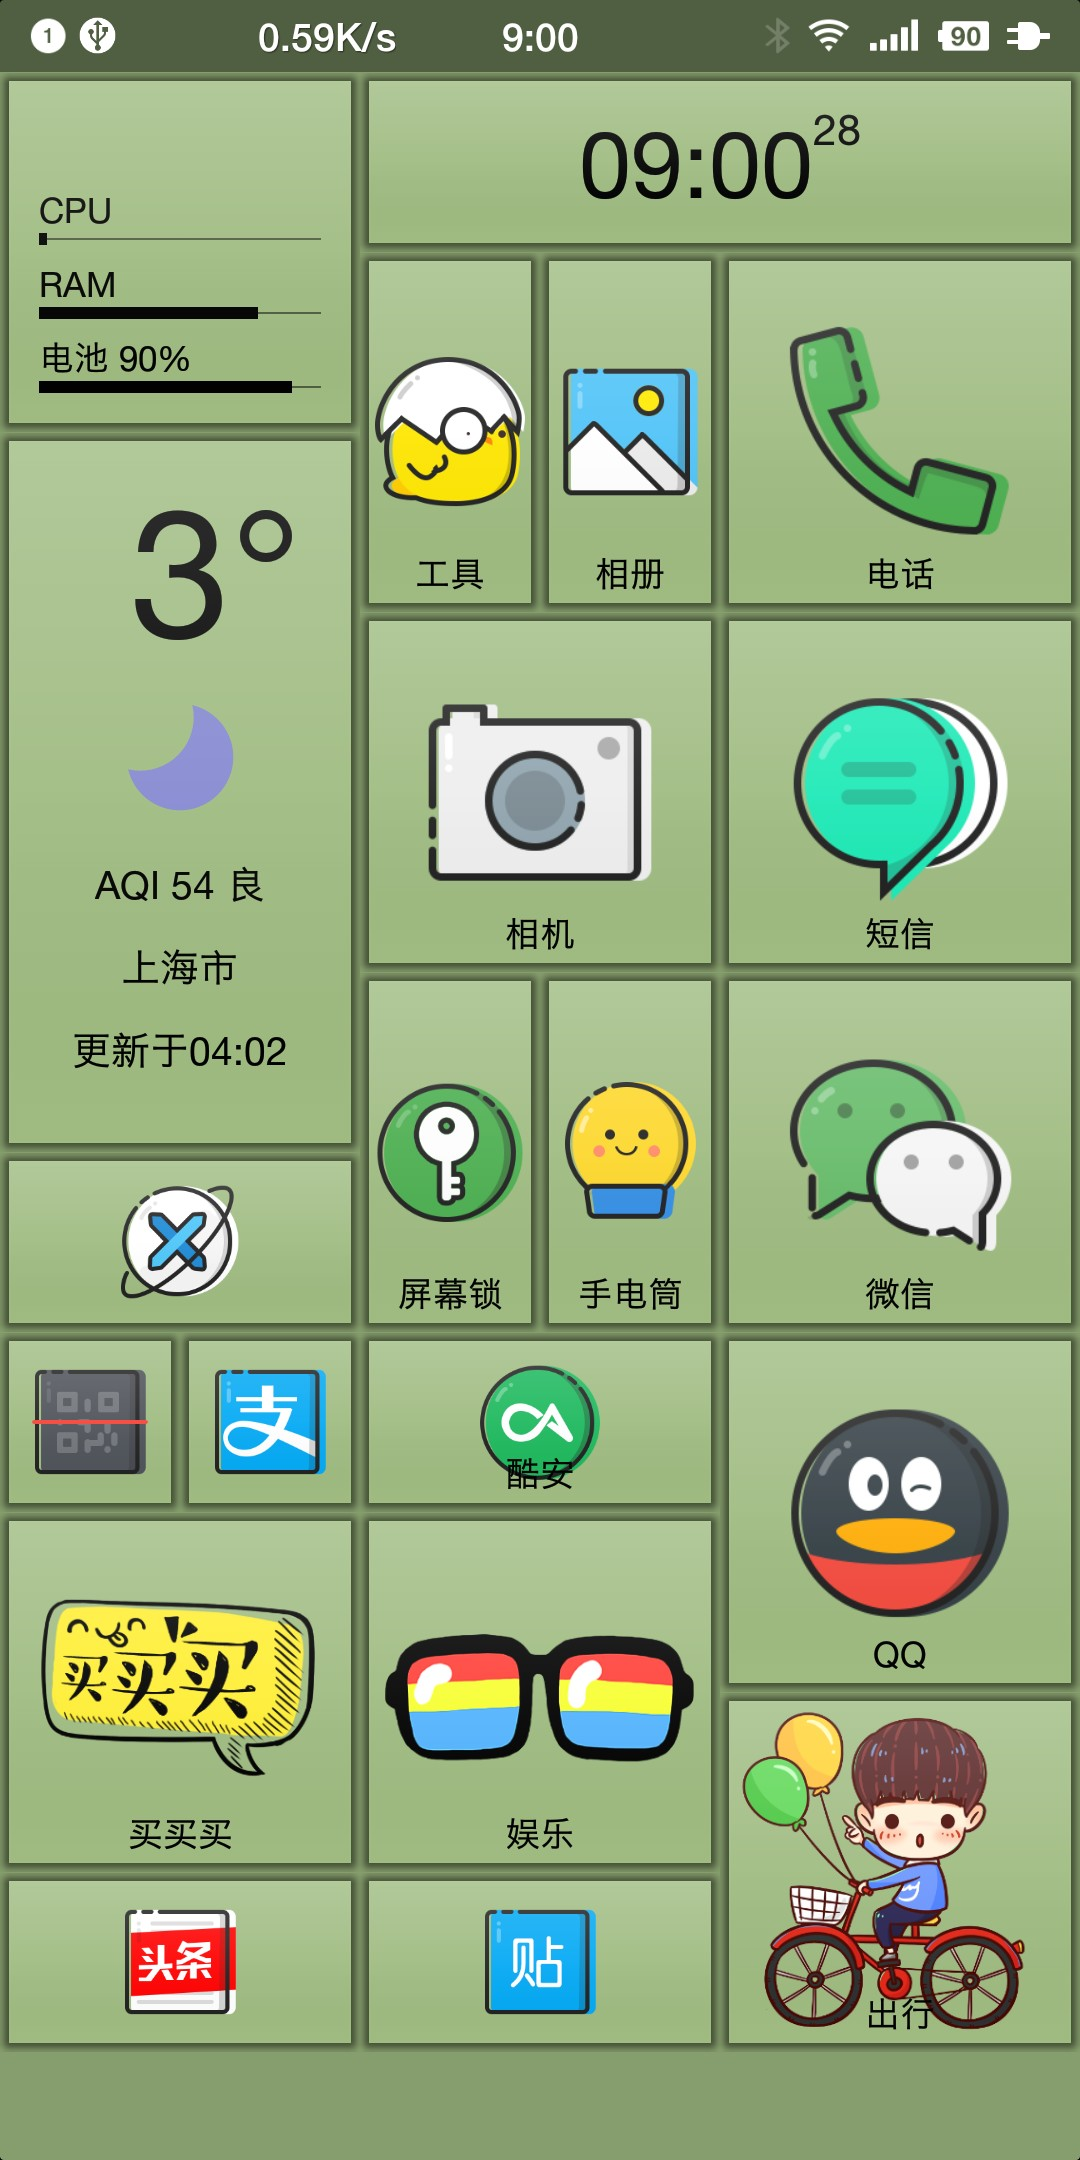 Screenshot_2018-01-10-09-00-29-085_???? 2.png